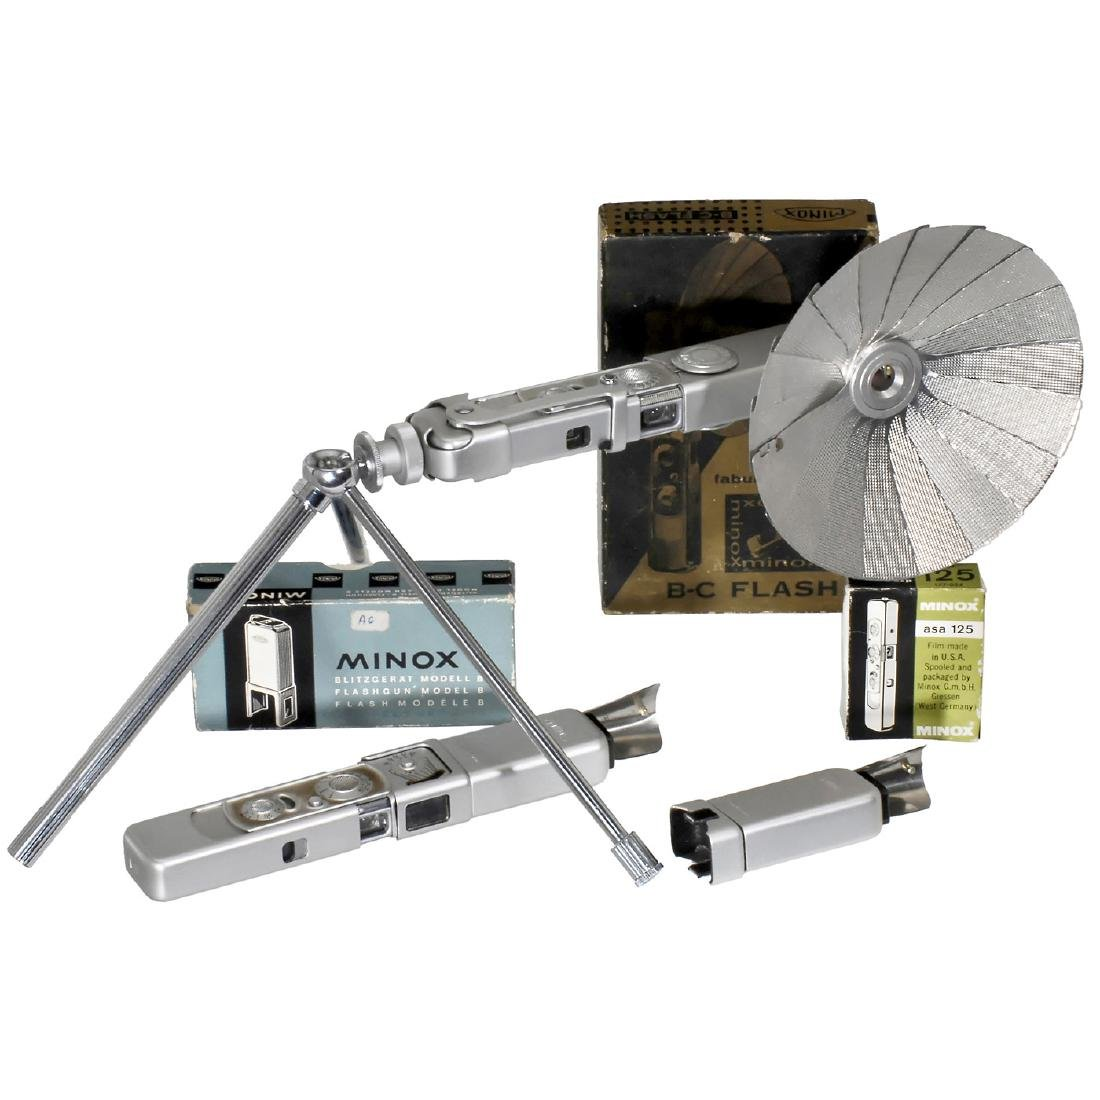 Minox Cameras and Accessories - 3